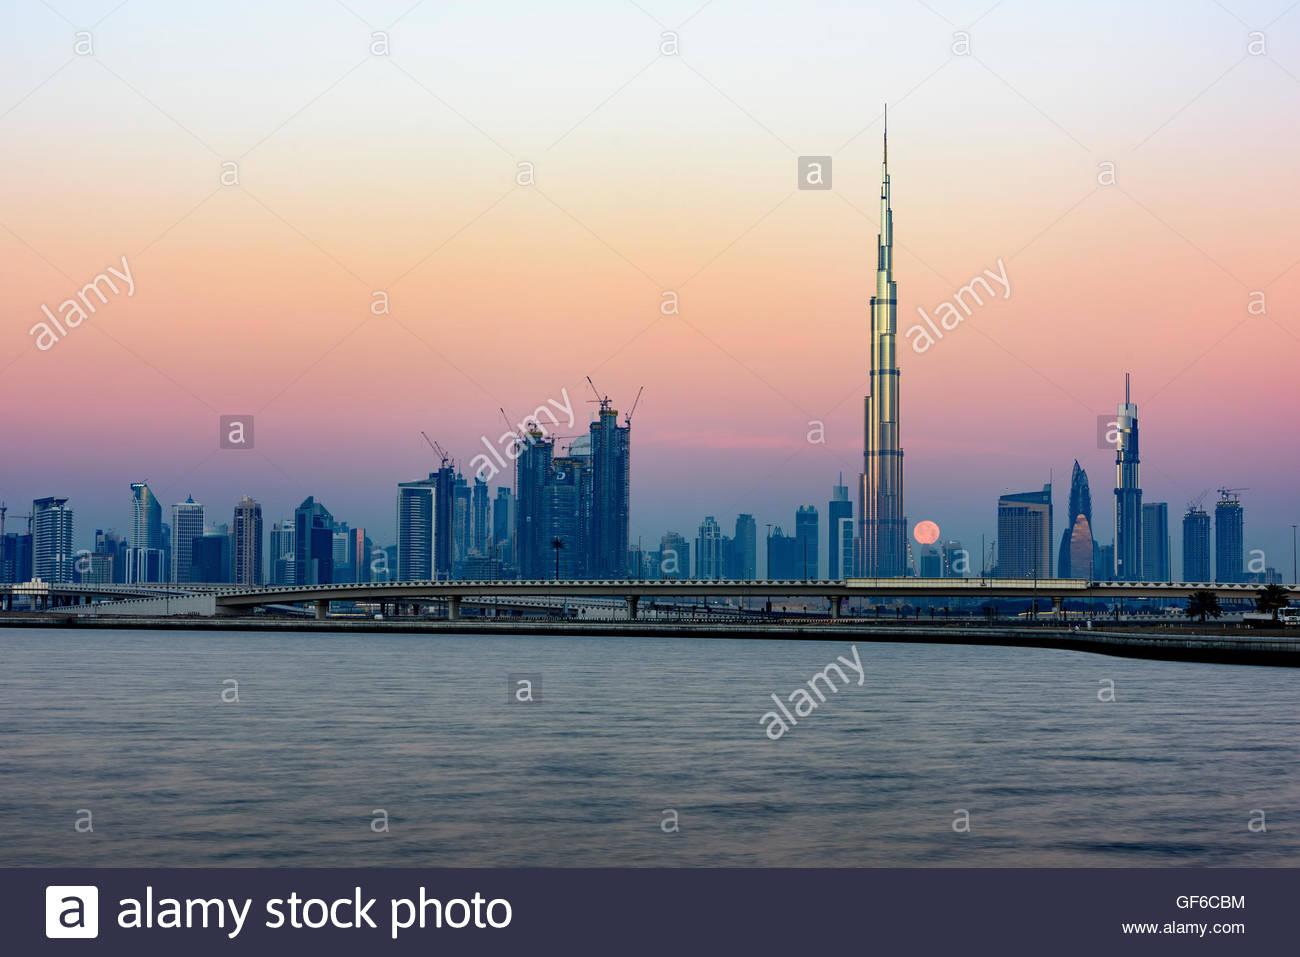 Moon passing behind Burj Khalifa, picture taken early morning from Al Jadaf - Stock Image